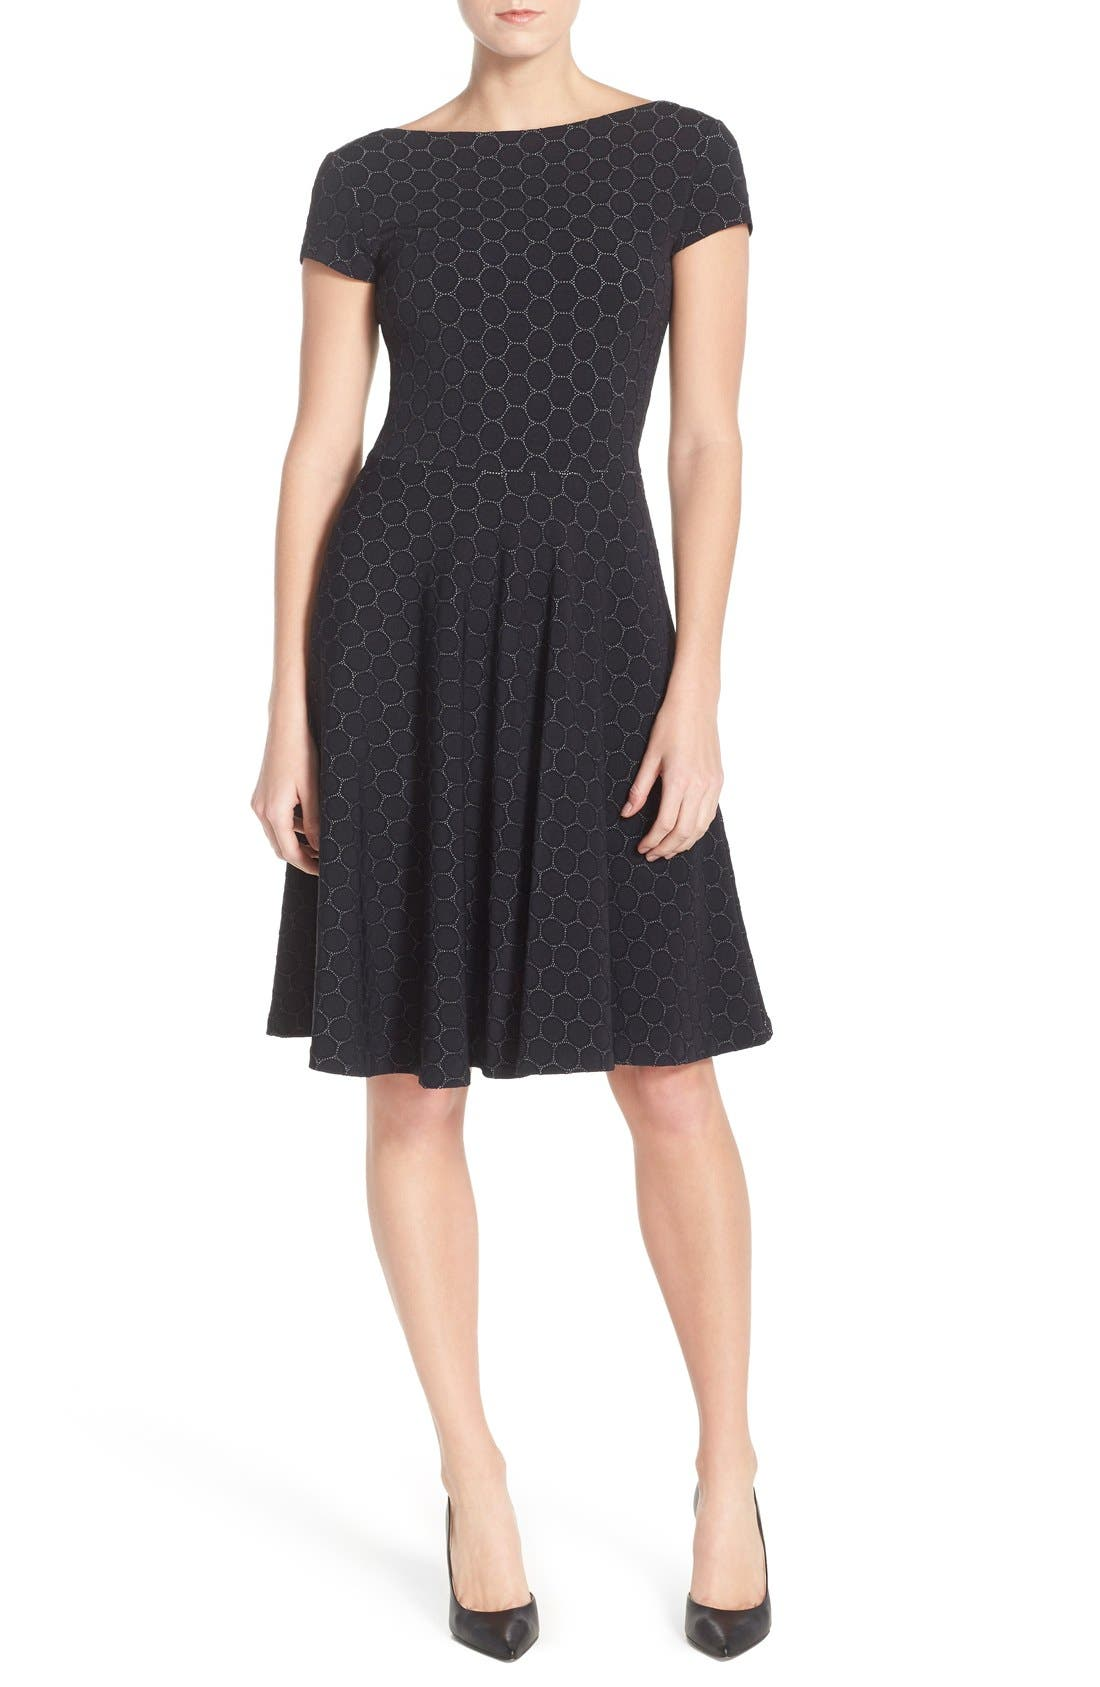 LEOTA 'Circle' Jacquard Woven Jersey Dress, Main, color, BLACK CAMEO CLOTH